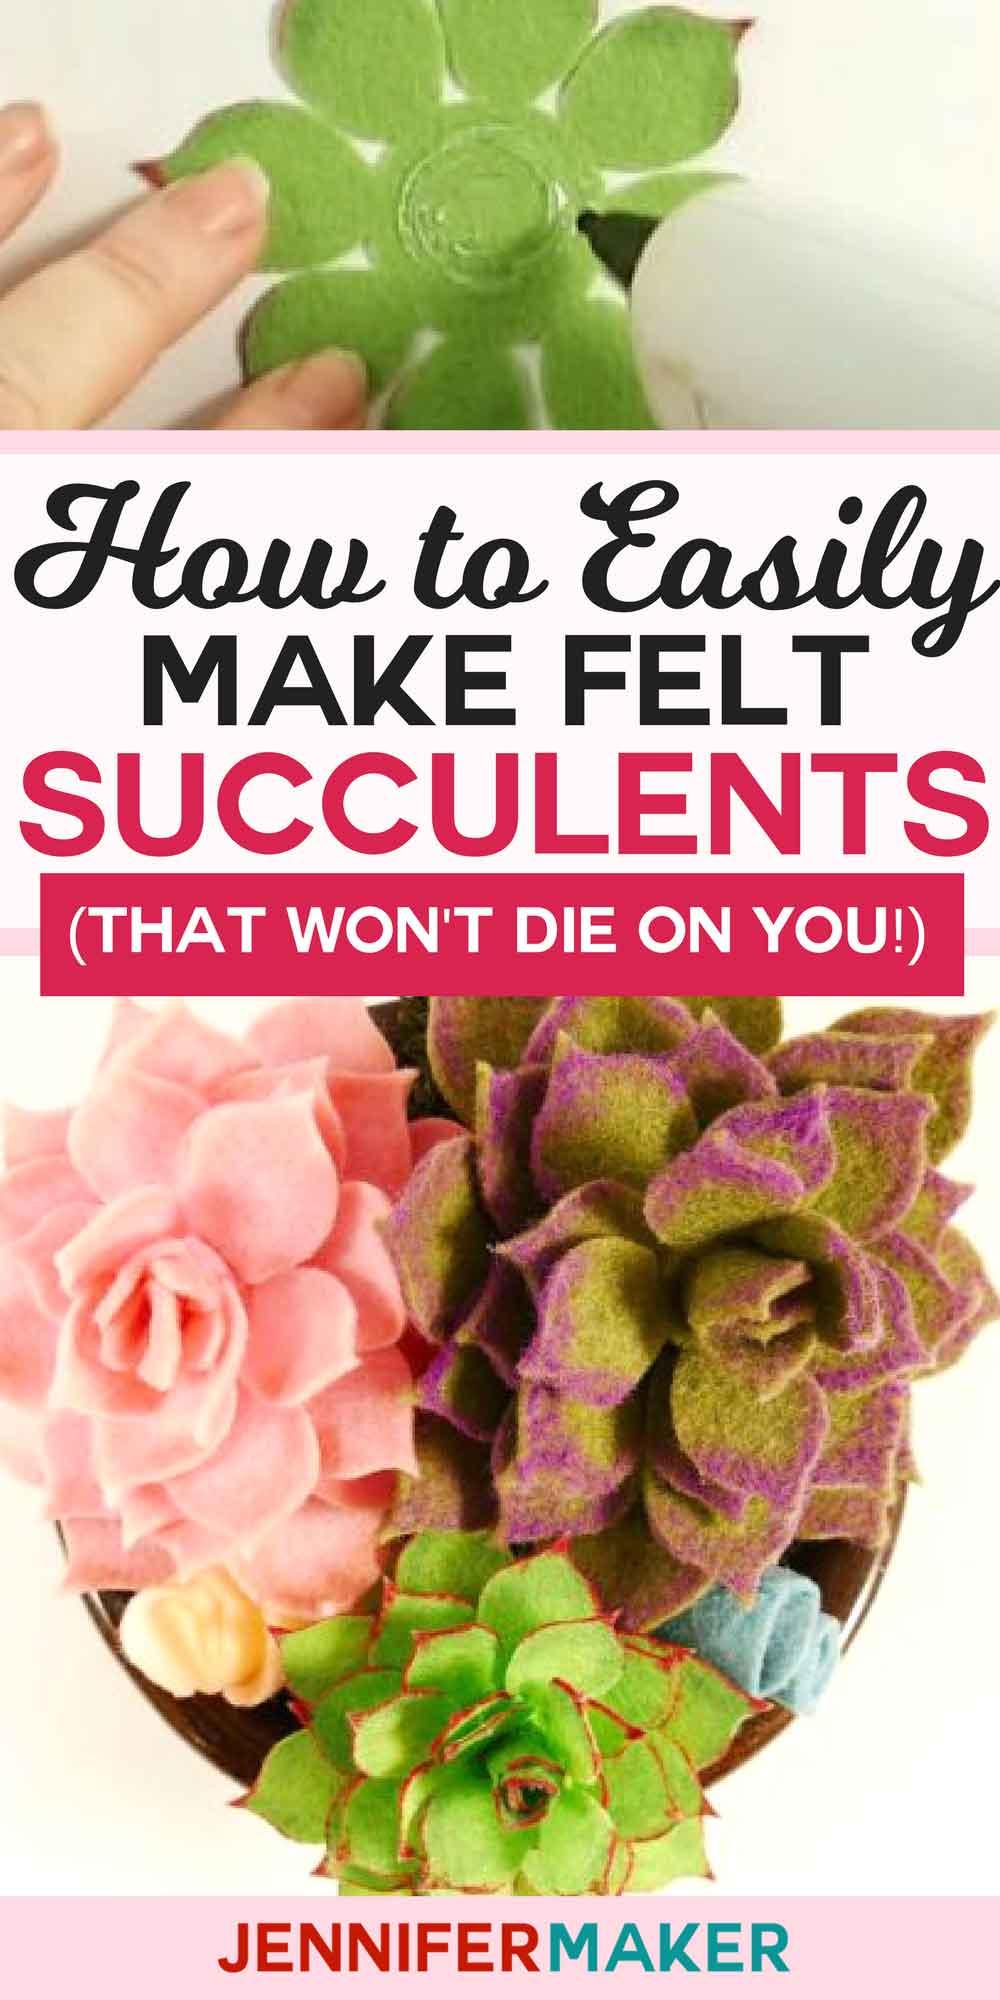 How to Make Felt Succulents That Are Easy!   Felt Plants   Free Cricut SVG Cut File #felt #homedecor #cricut